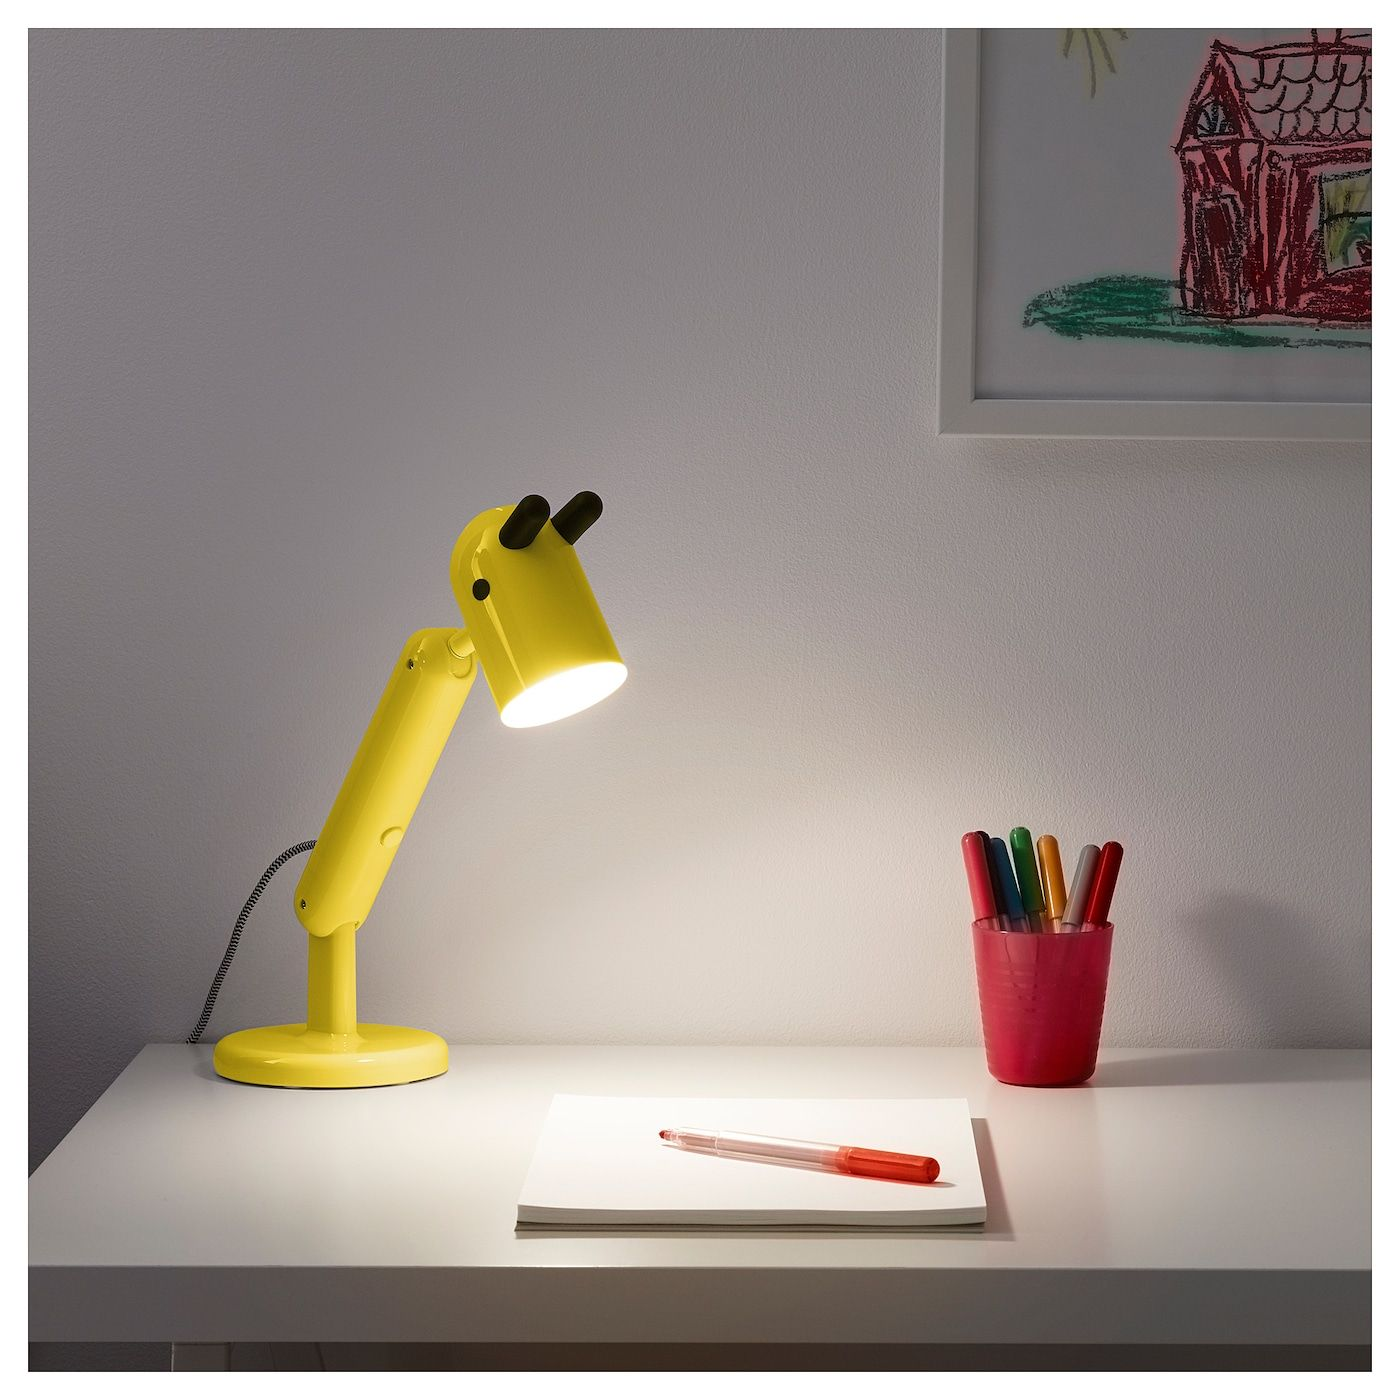 Ikea Krux Led Work Lamp Lamp Work Lamp Modern Lamp